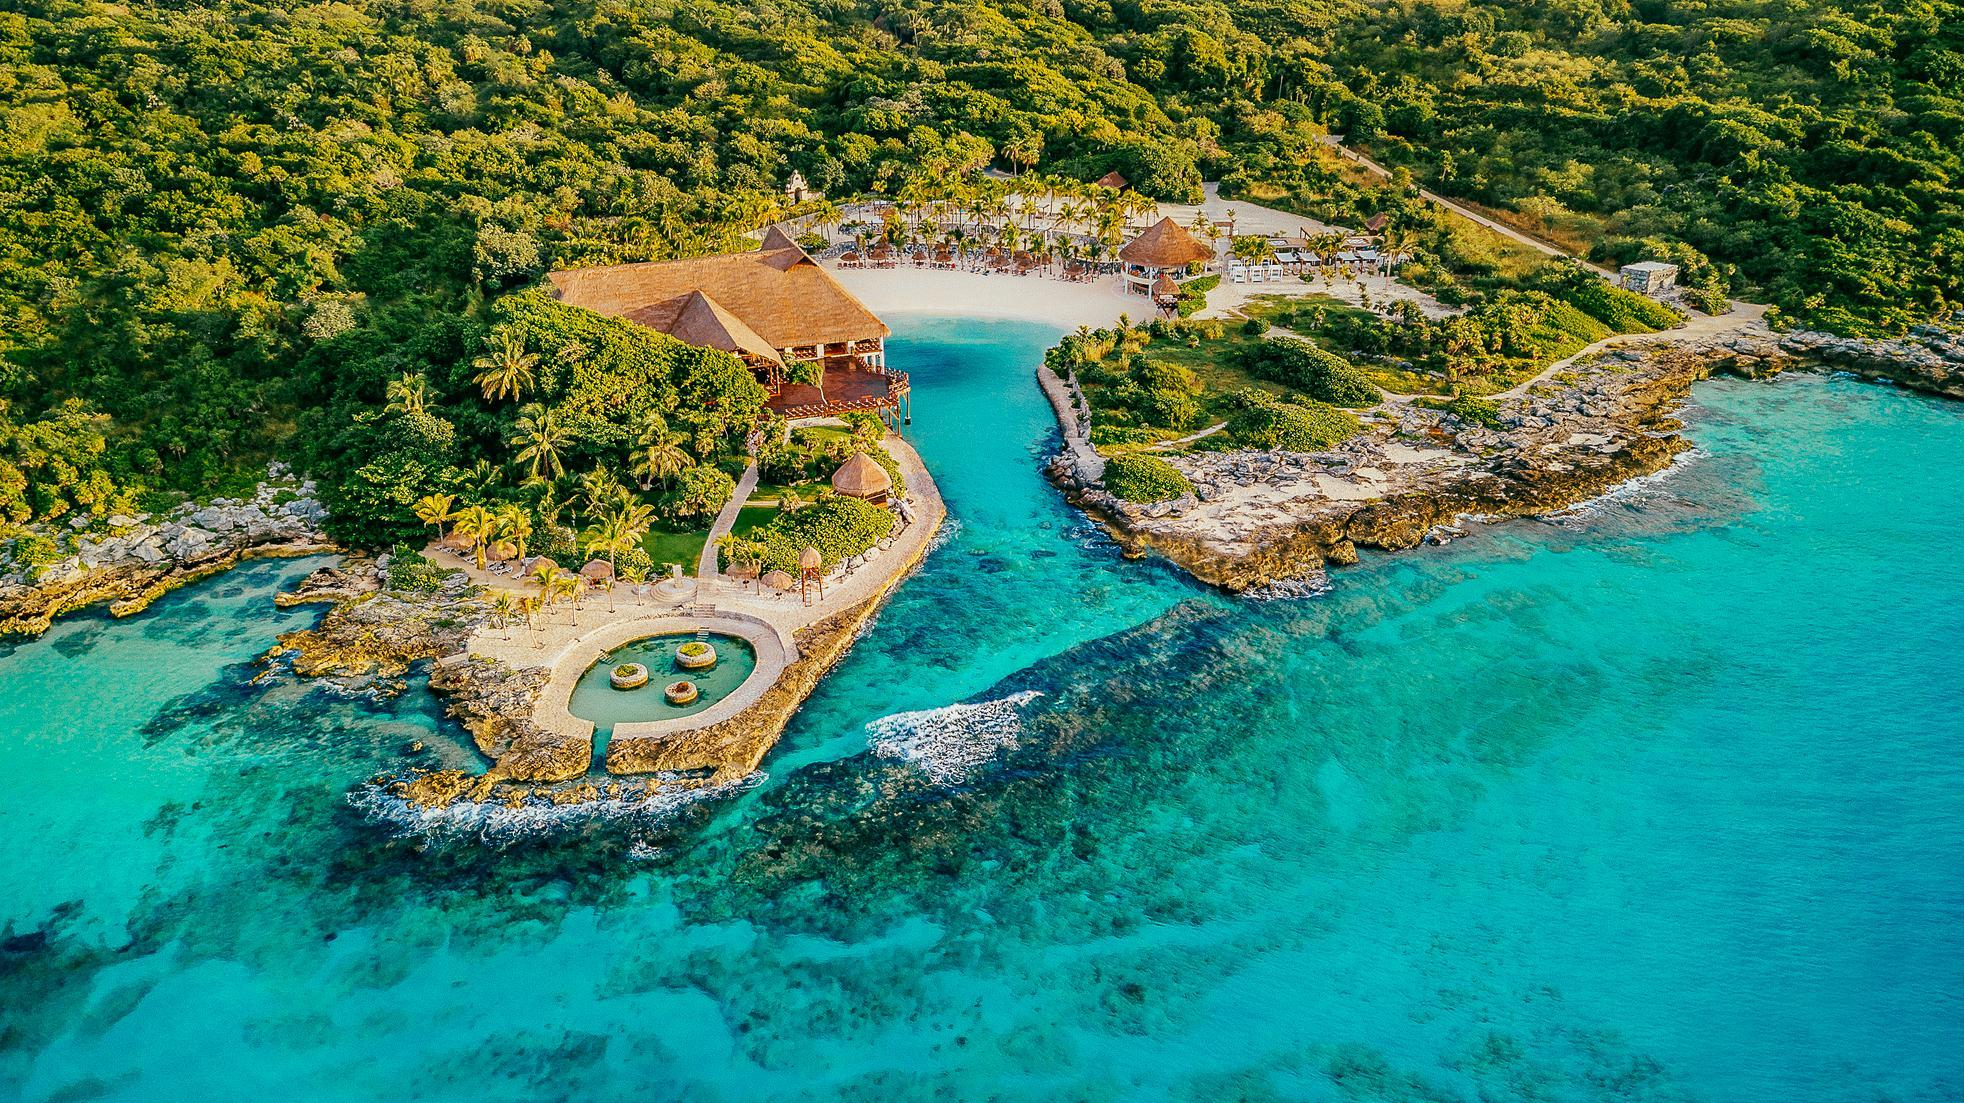 occidental xcaret resort deals